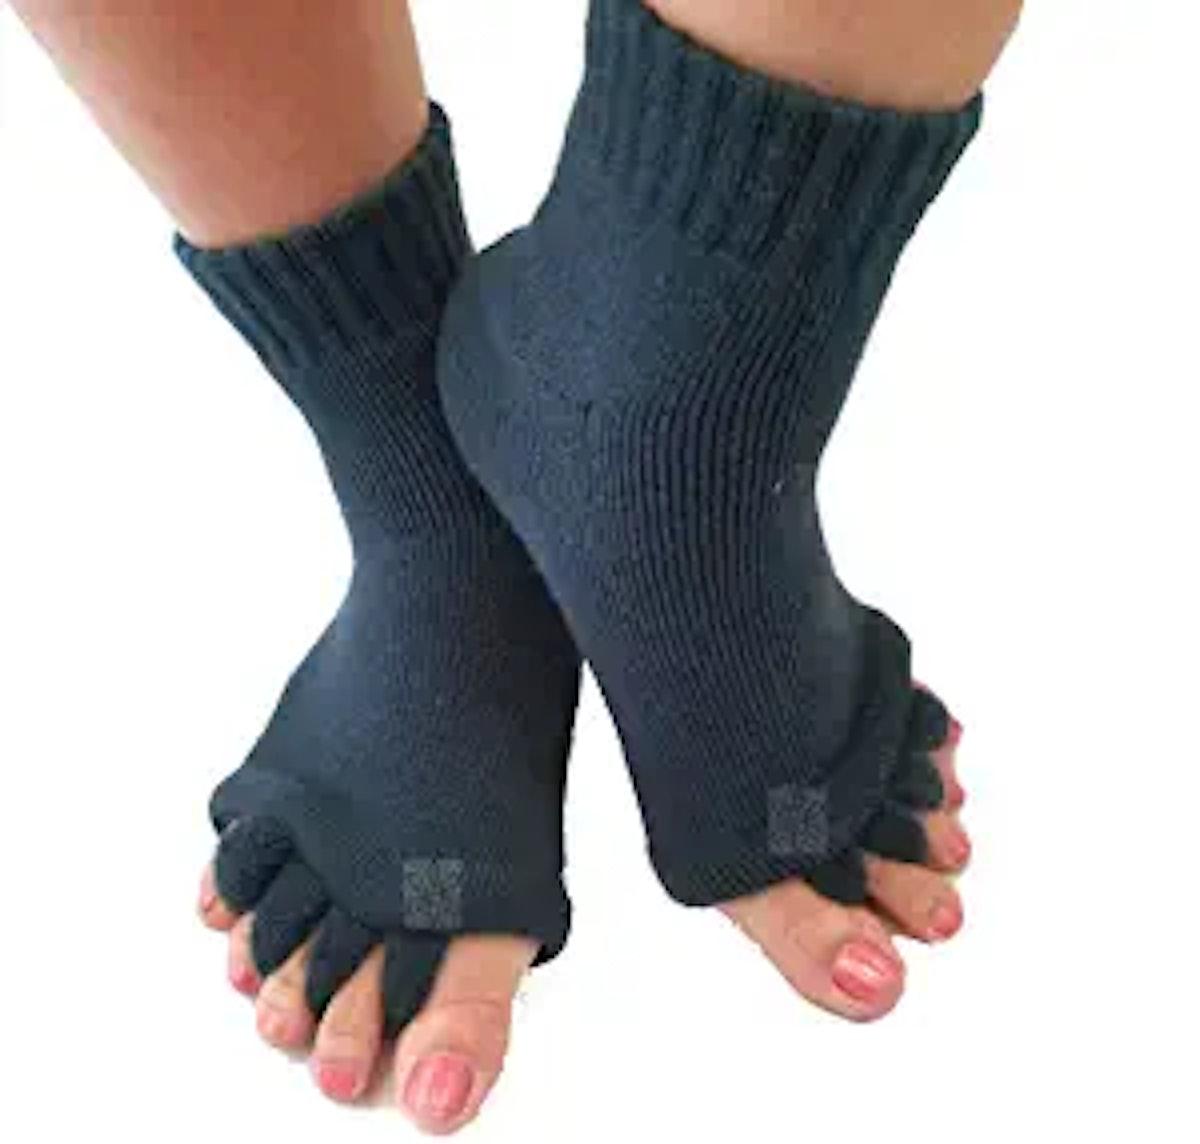 Triim Fitness Toe Separator